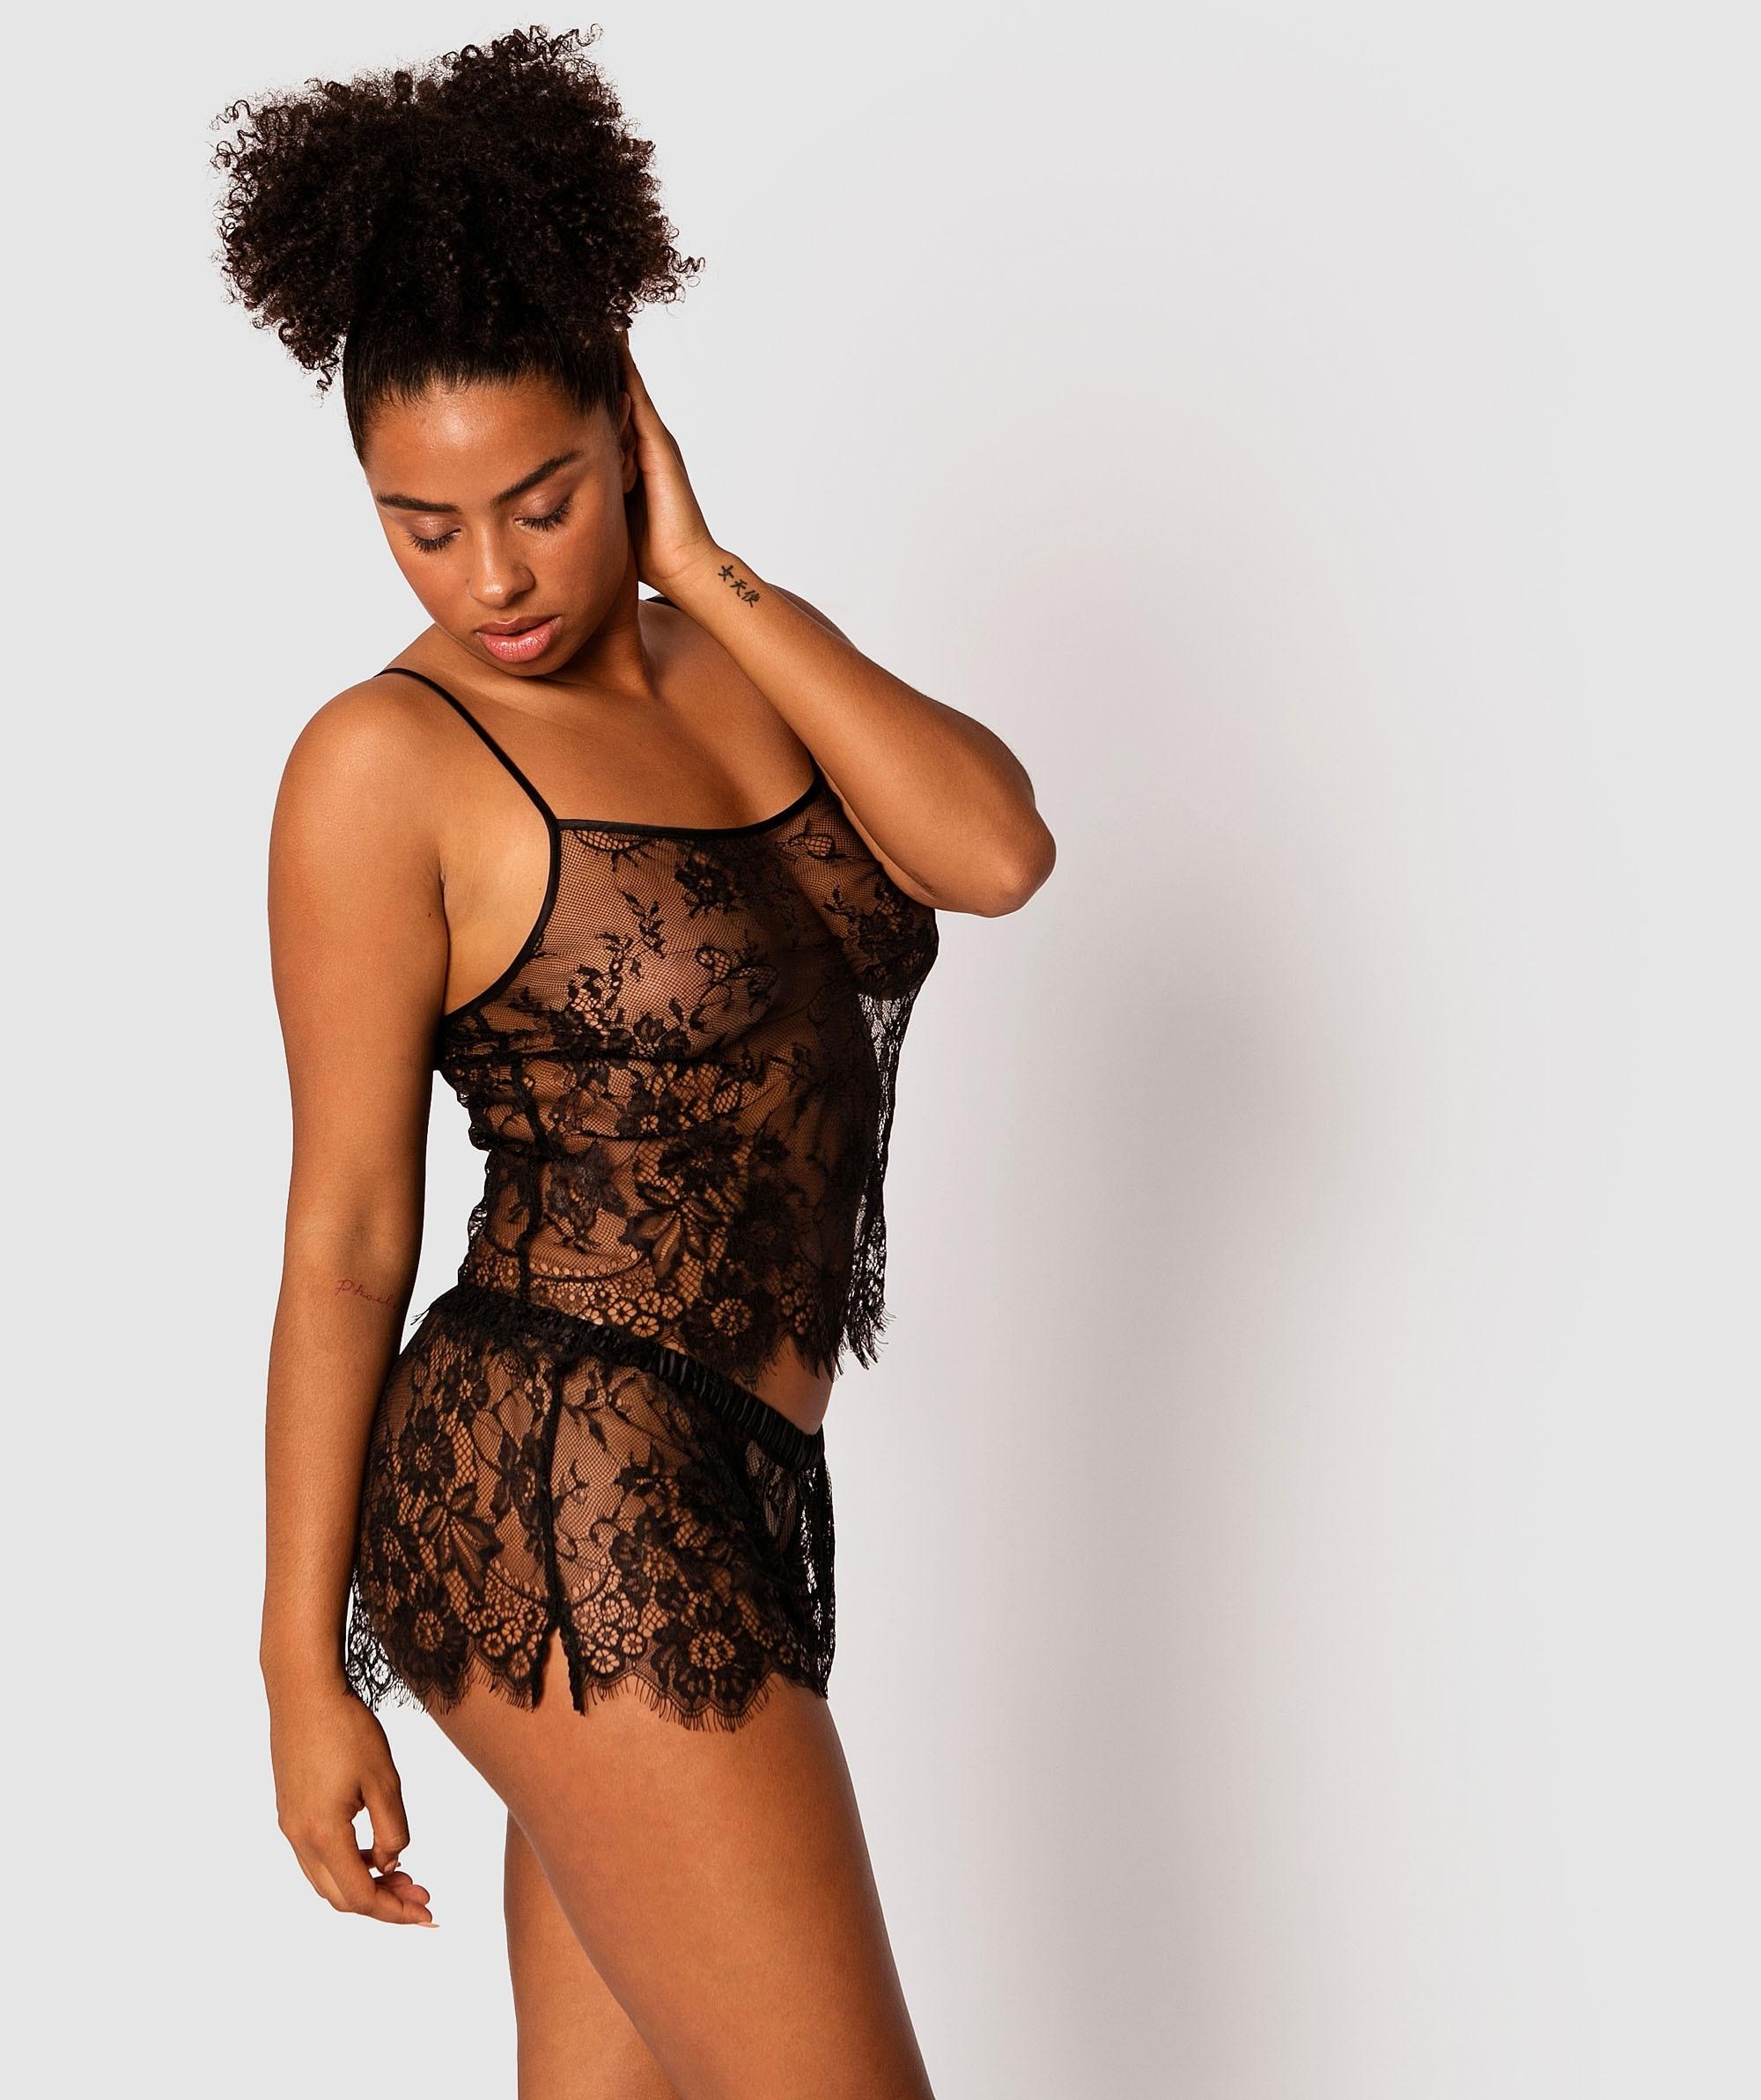 Gabriela Cami - Black